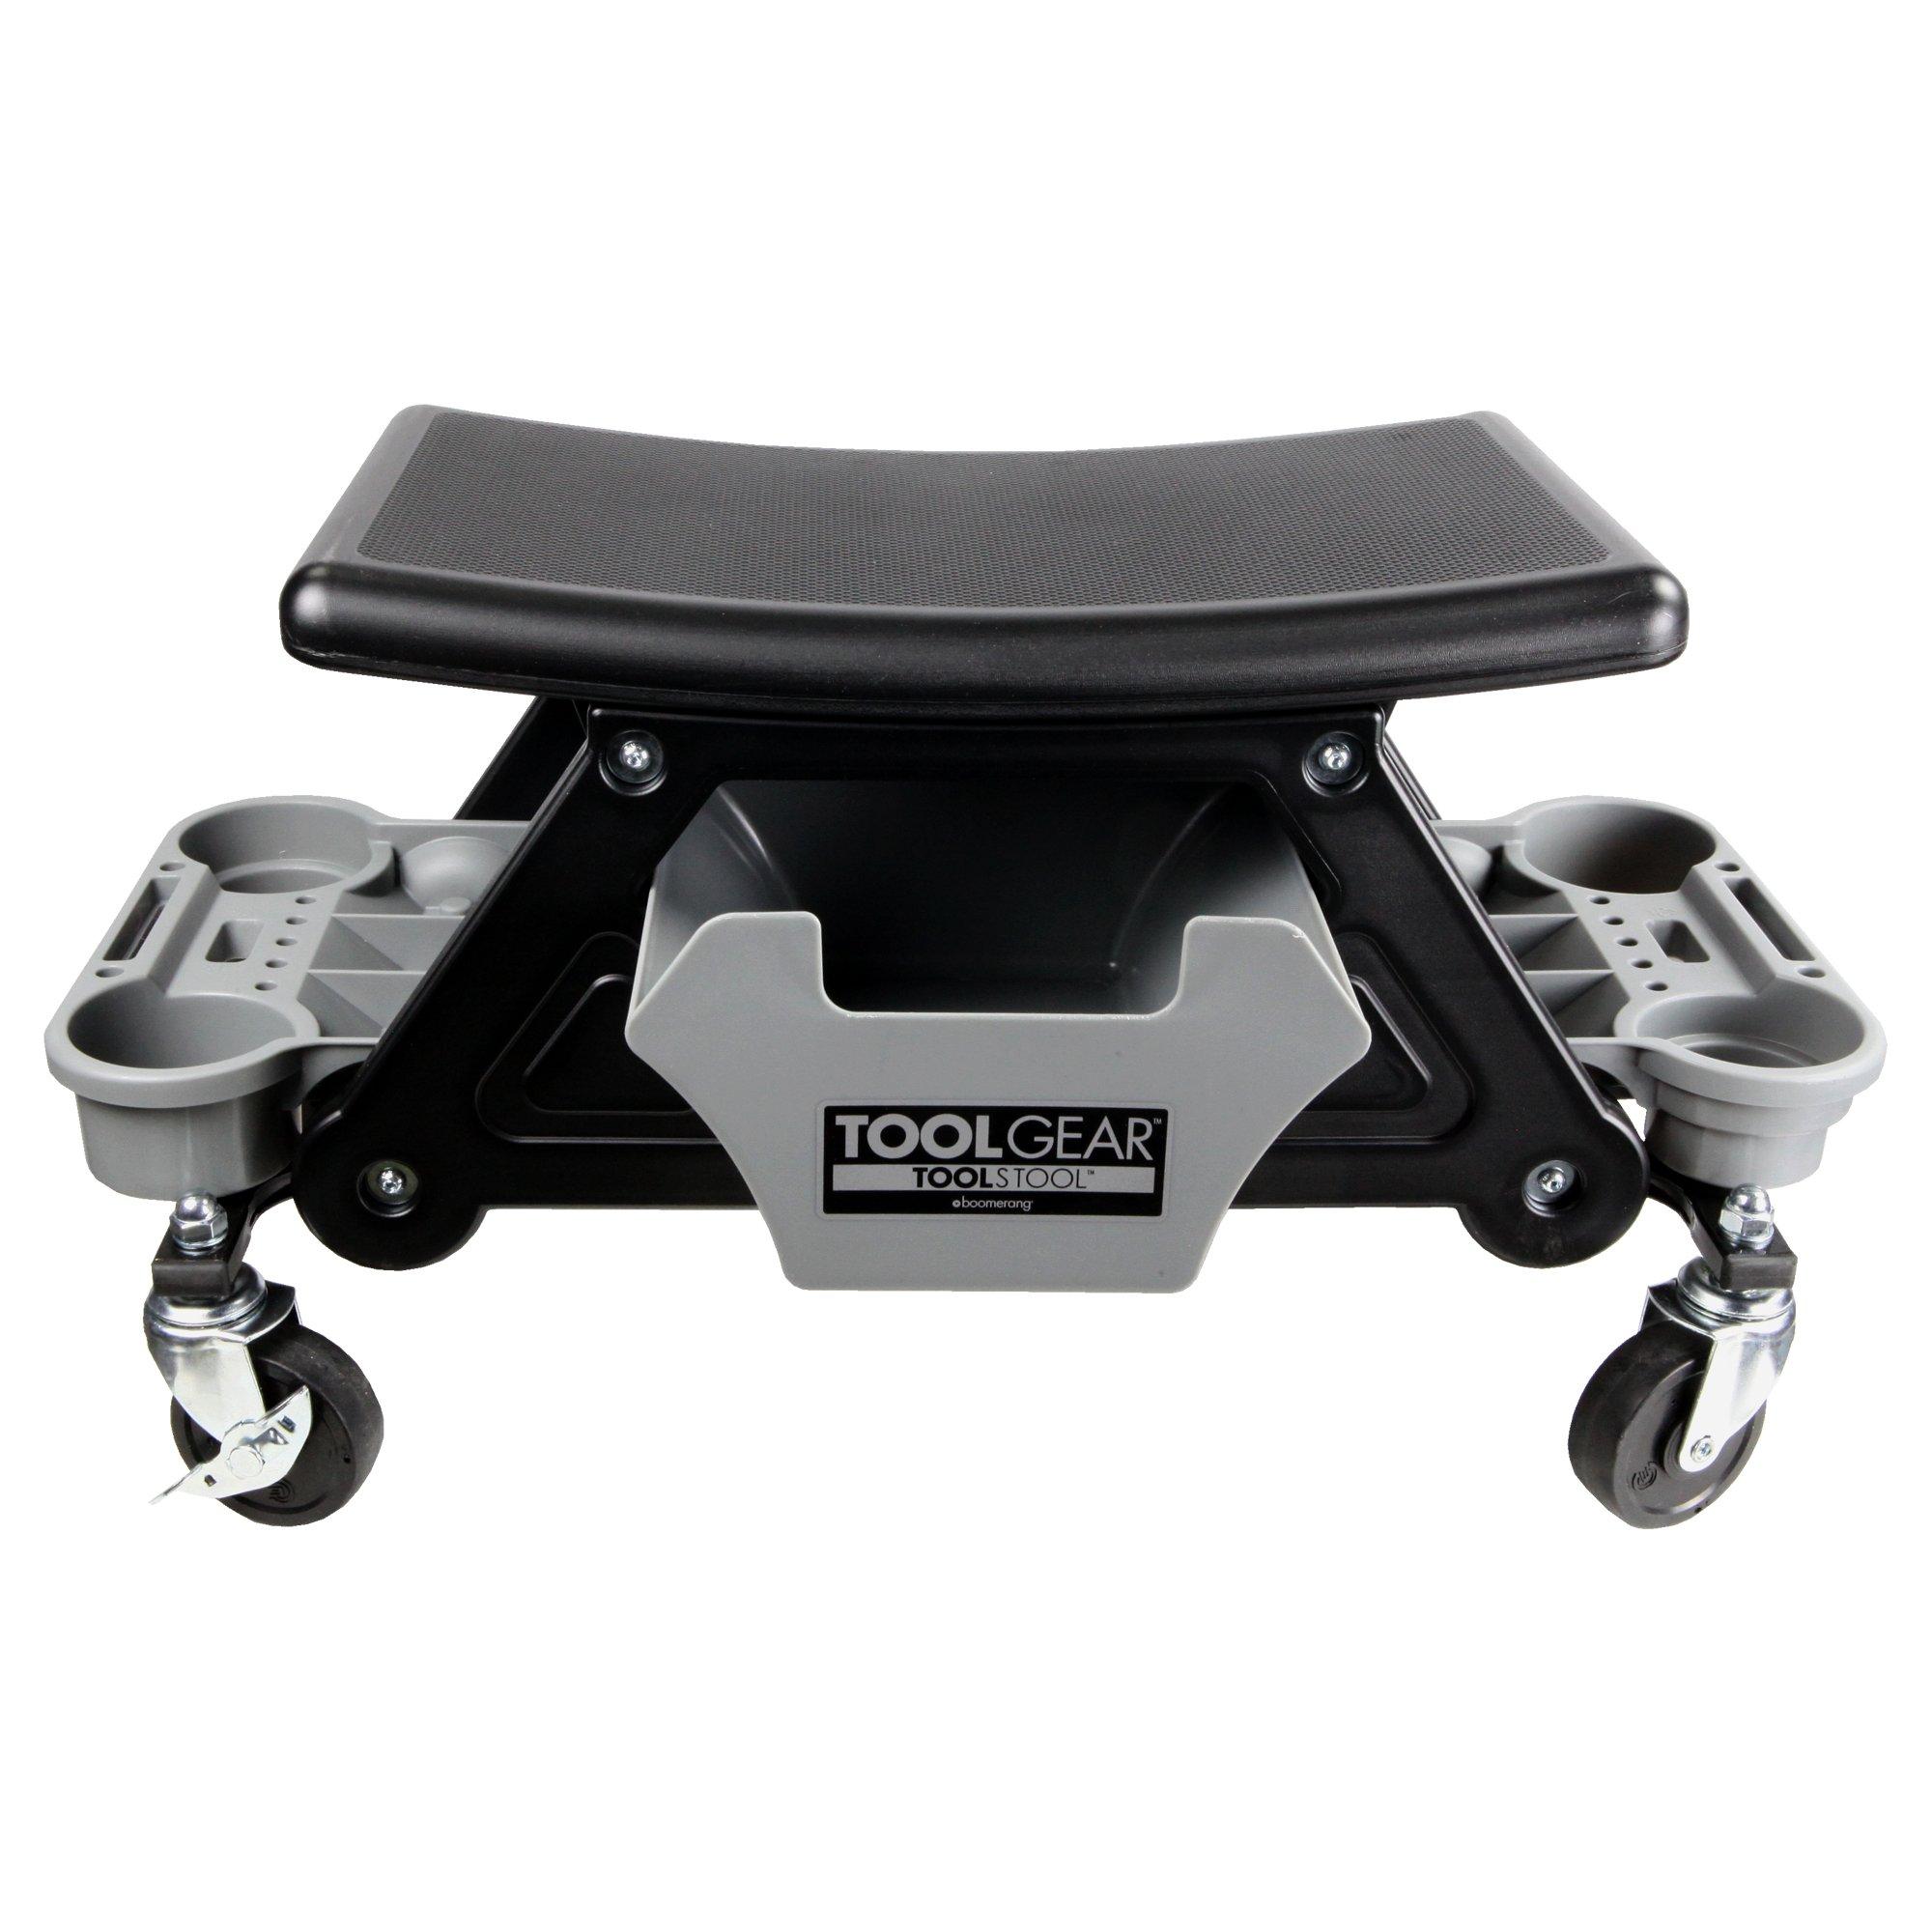 Boomerang ToolStool Roller-Seat Shop-Cart by Boomerang (Image #2)